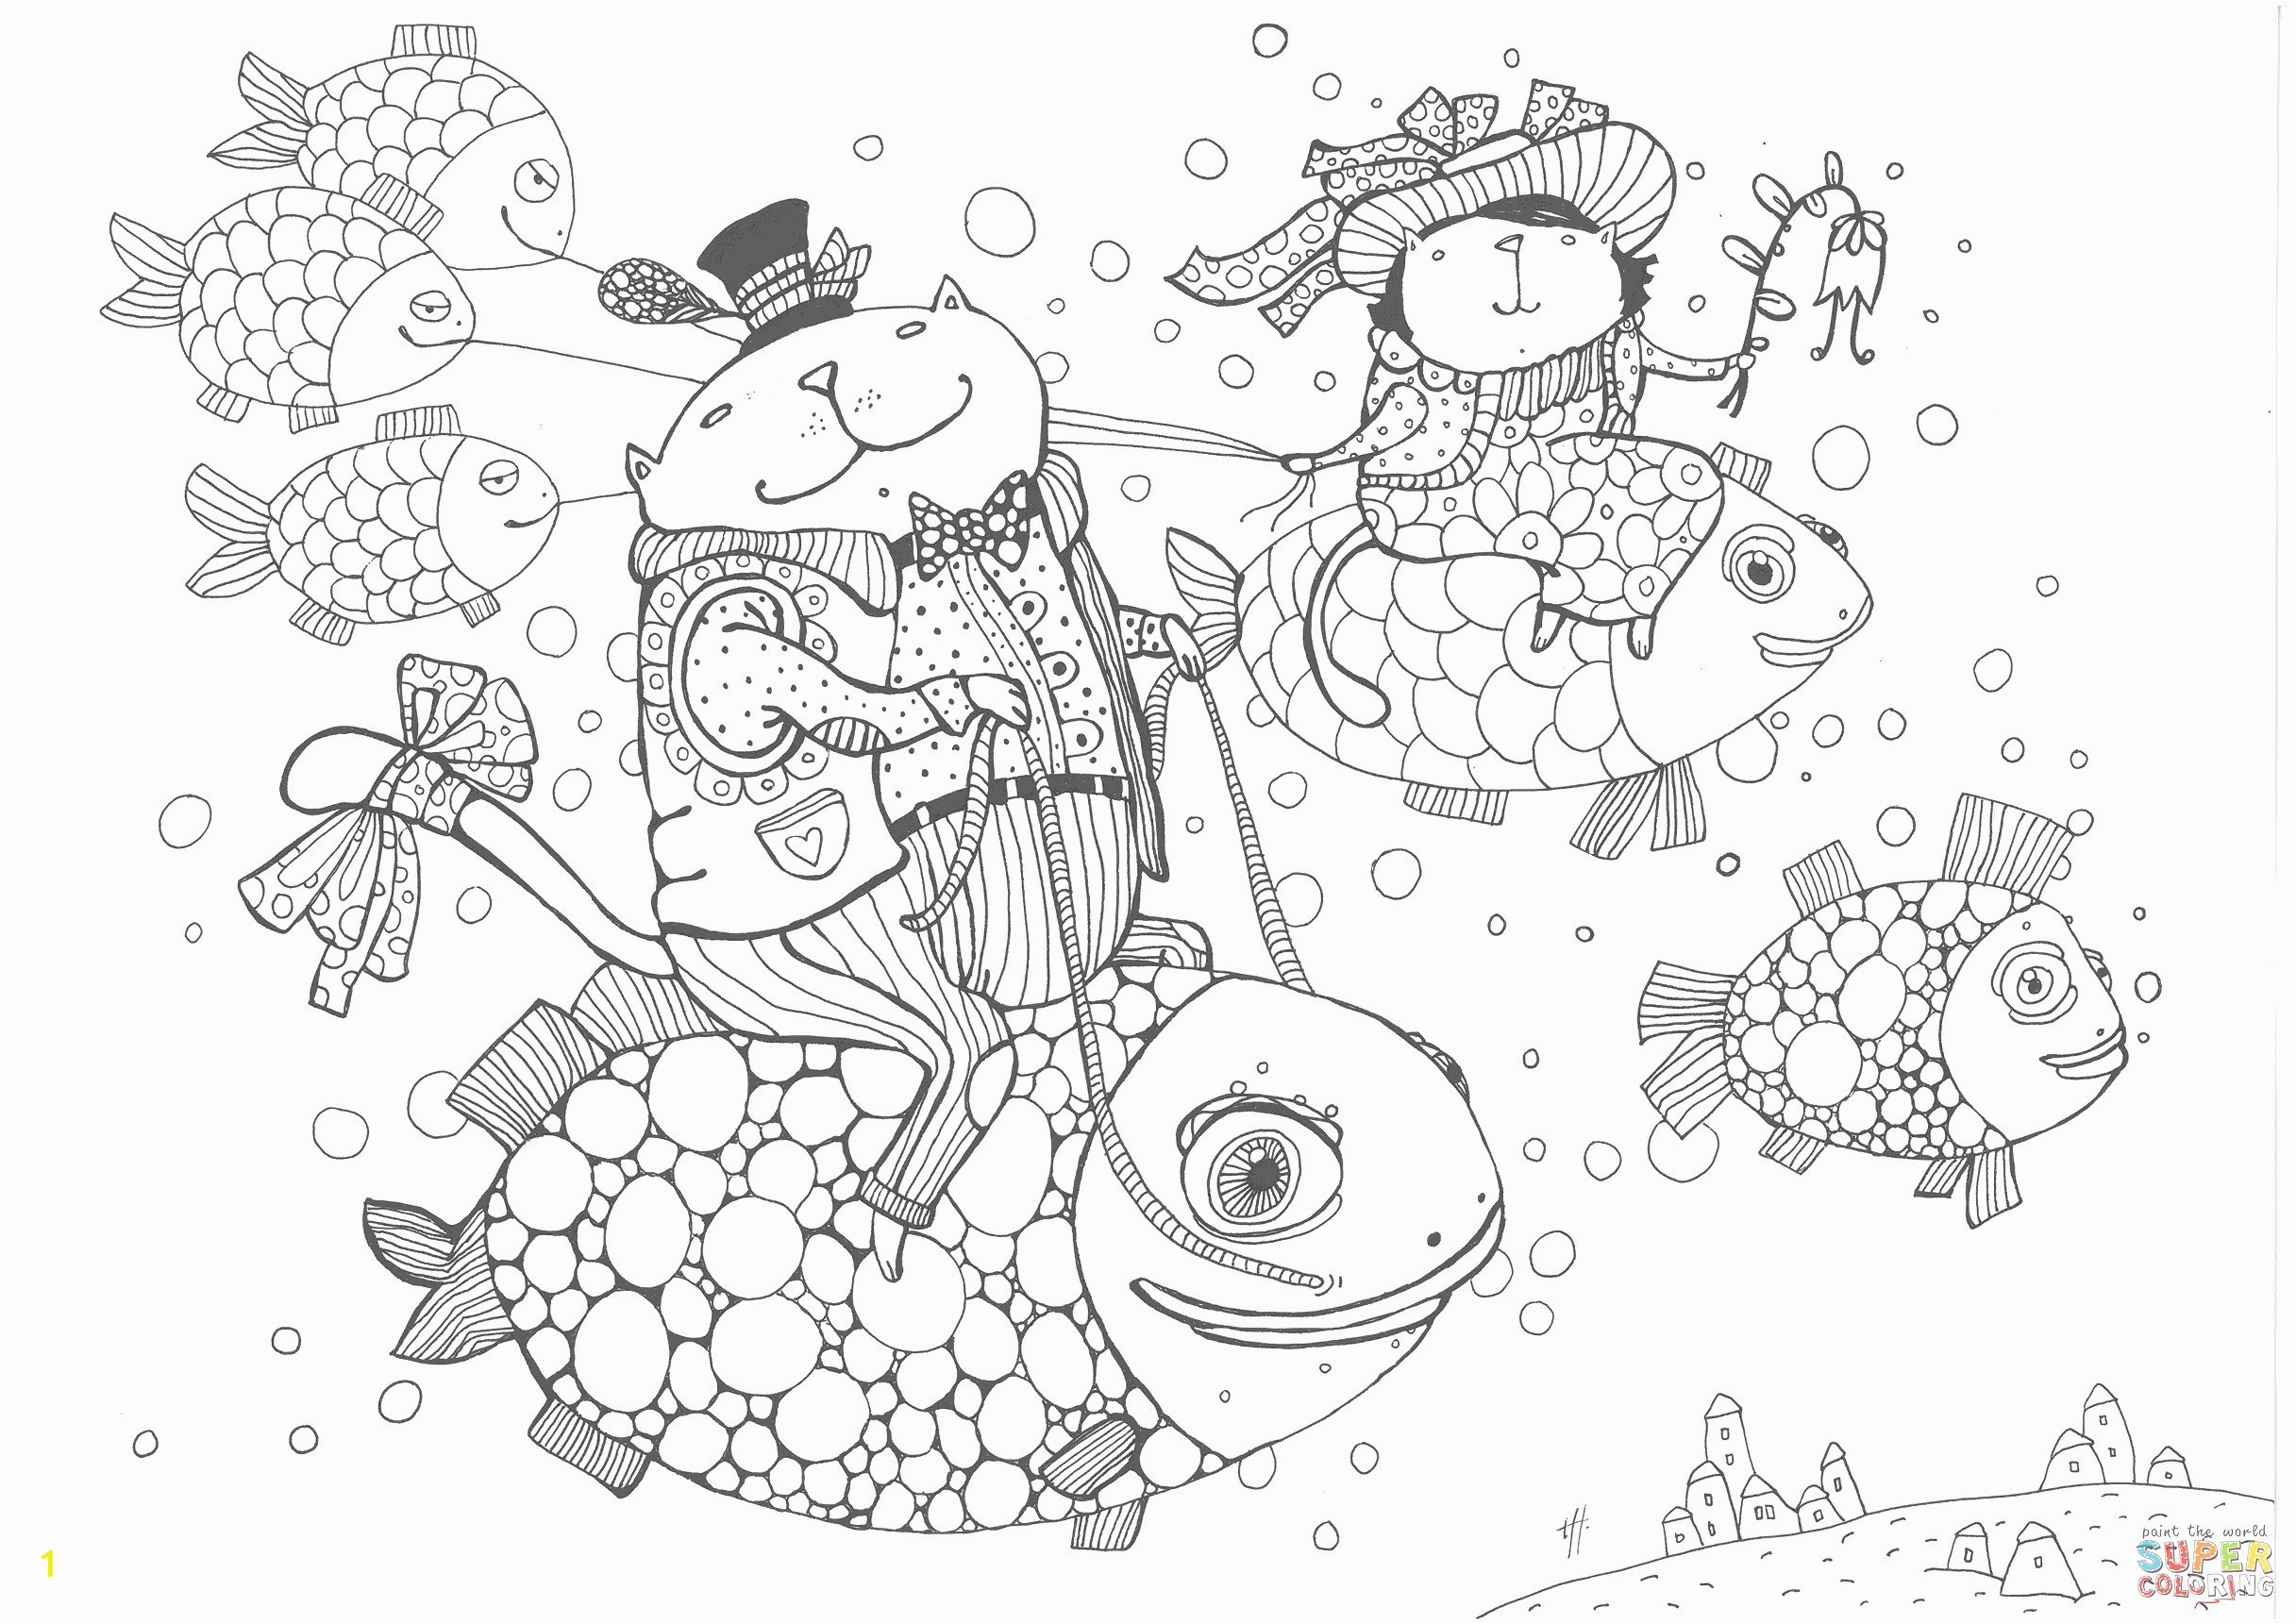 fancykeleton coloring pages printable for kidsplendi humanheets elegant